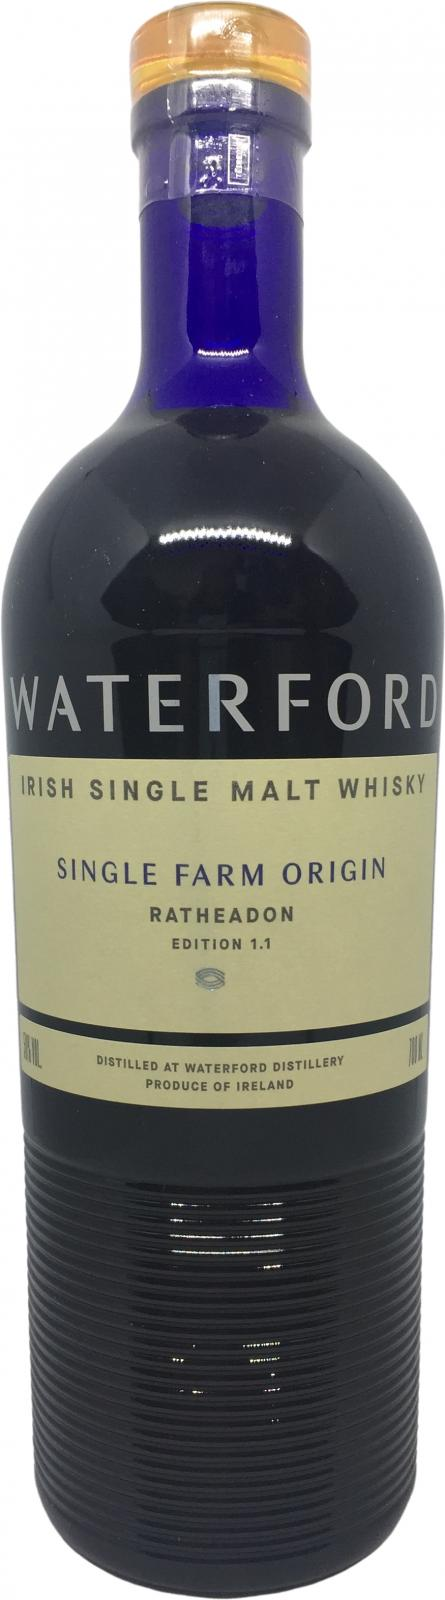 Waterford Ratheadon: Edition 1.1